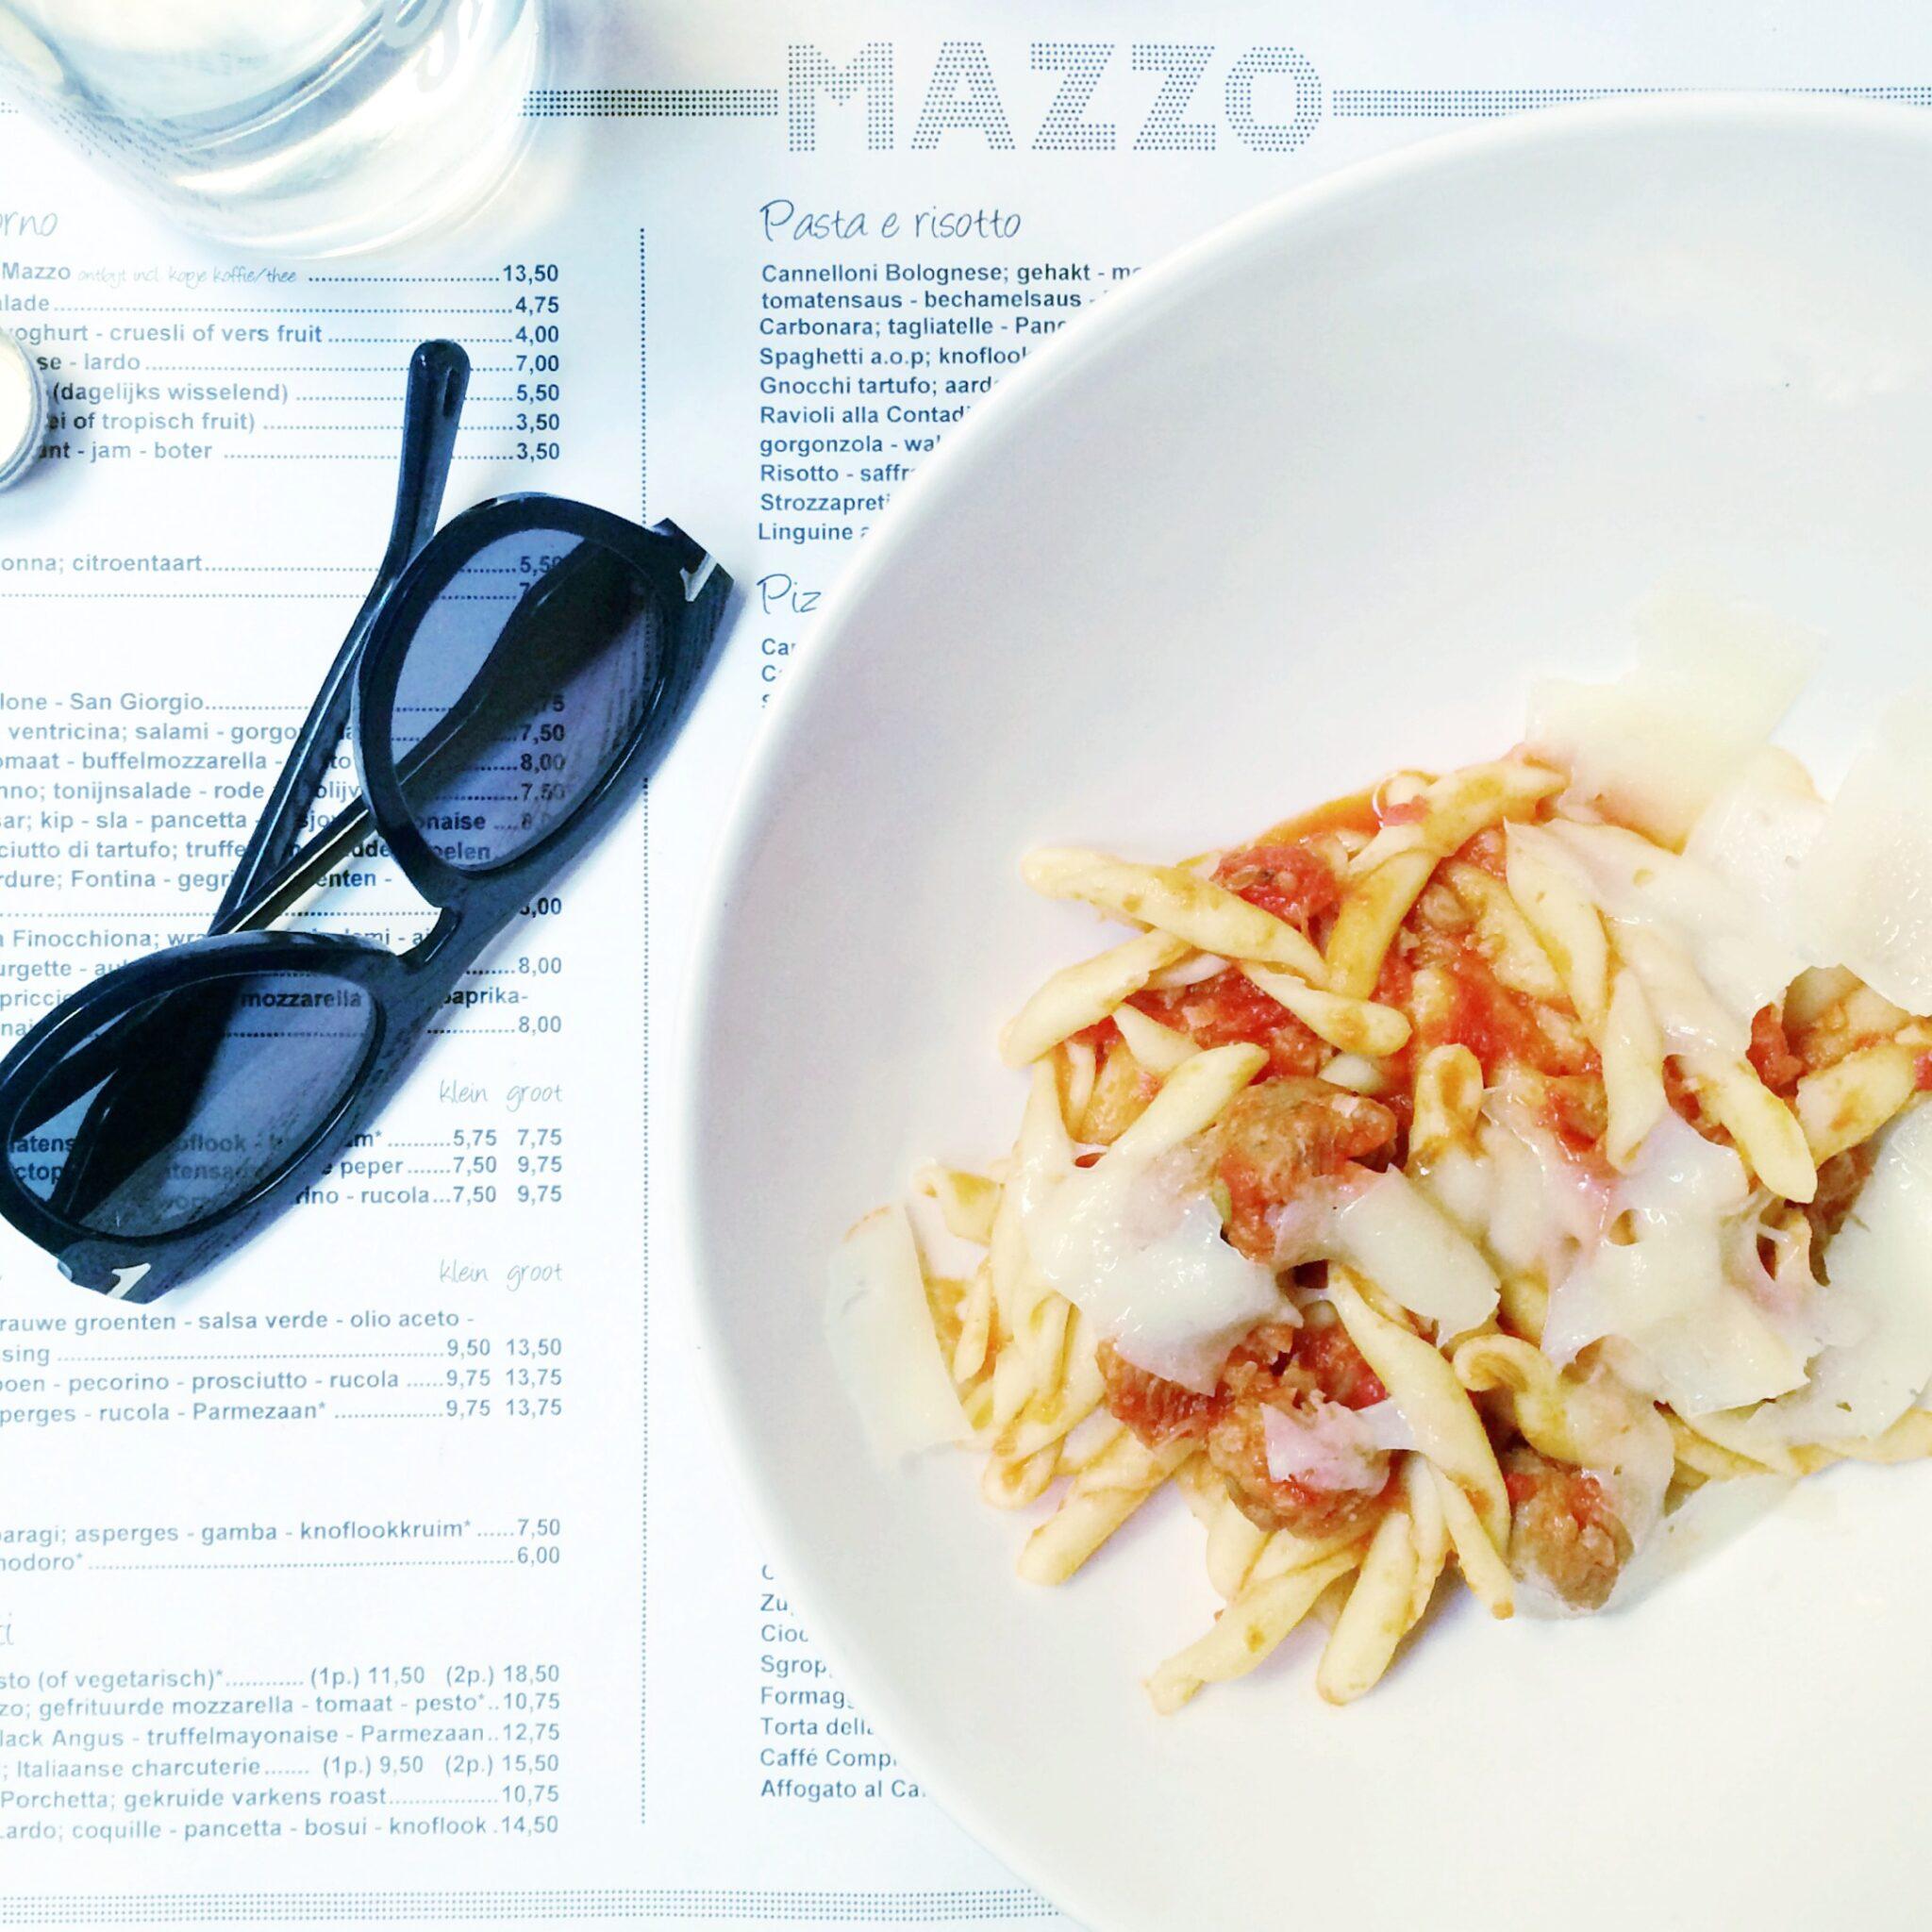 IMG 6475 - Review 020: Eten bij Mazzo Amsterdam + Pizza Sorpresa